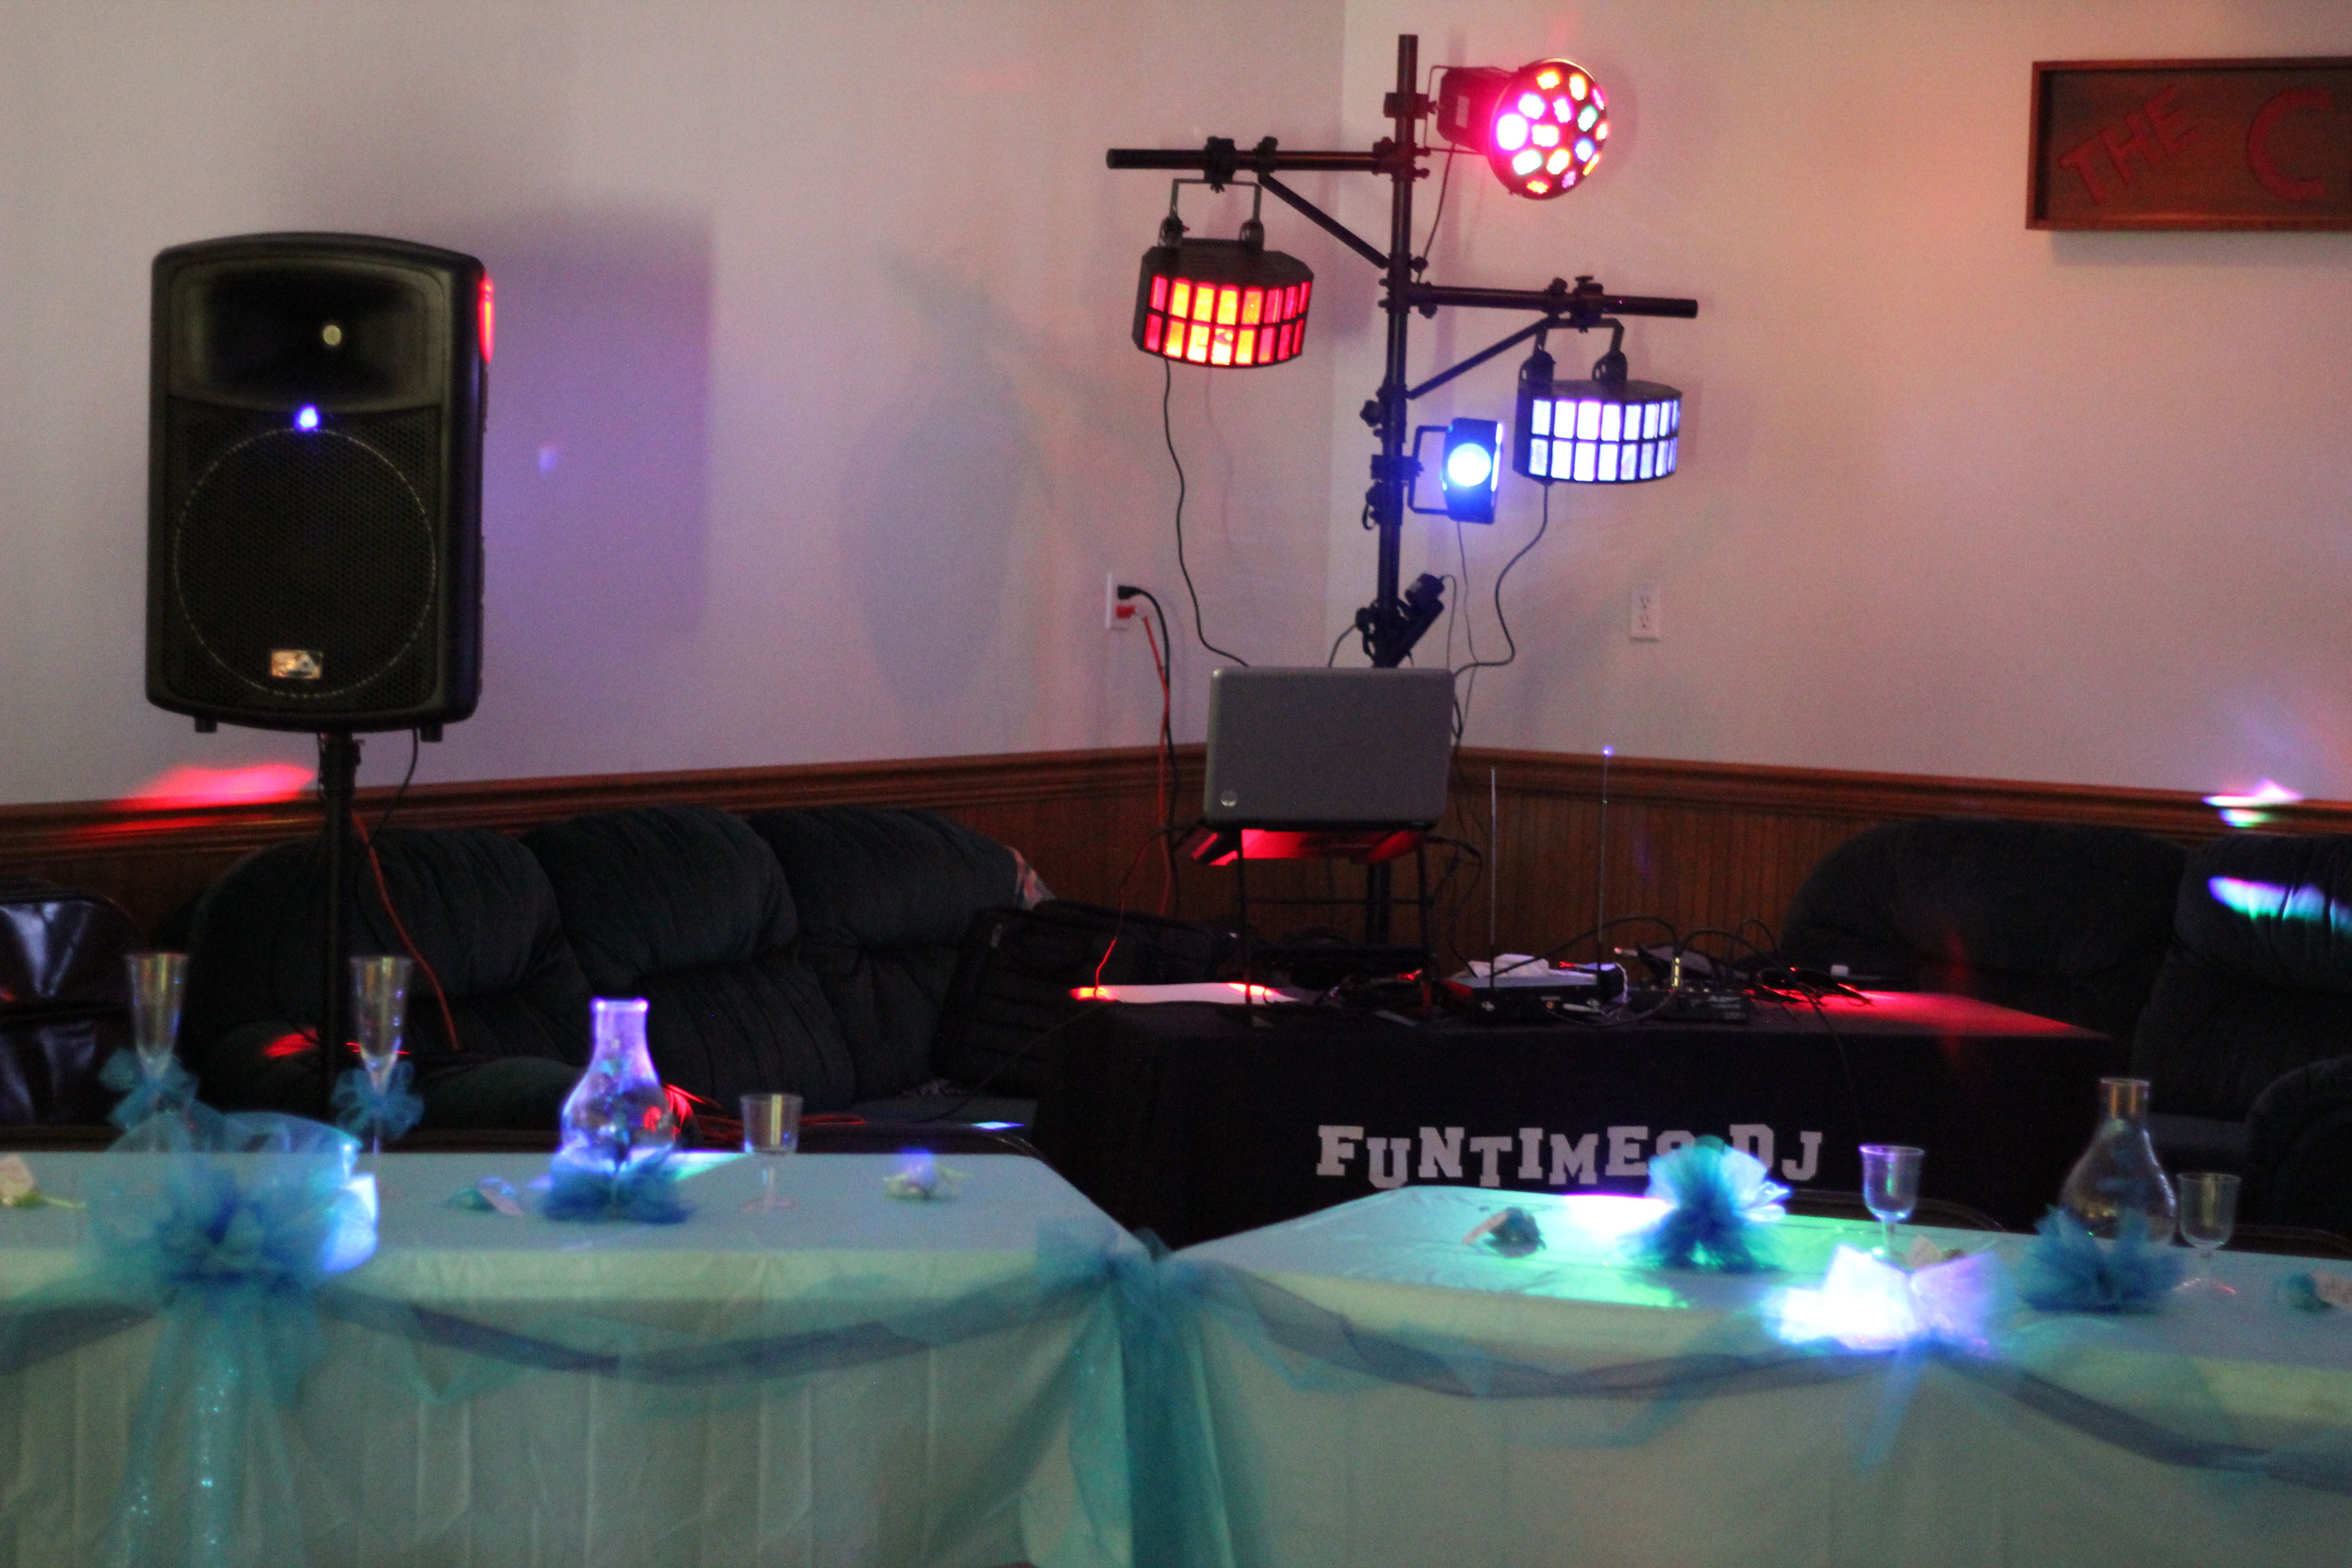 Small Wedding Setup 6 8 13 Wedding Dj Setup Dj Setup Wedding Set Up